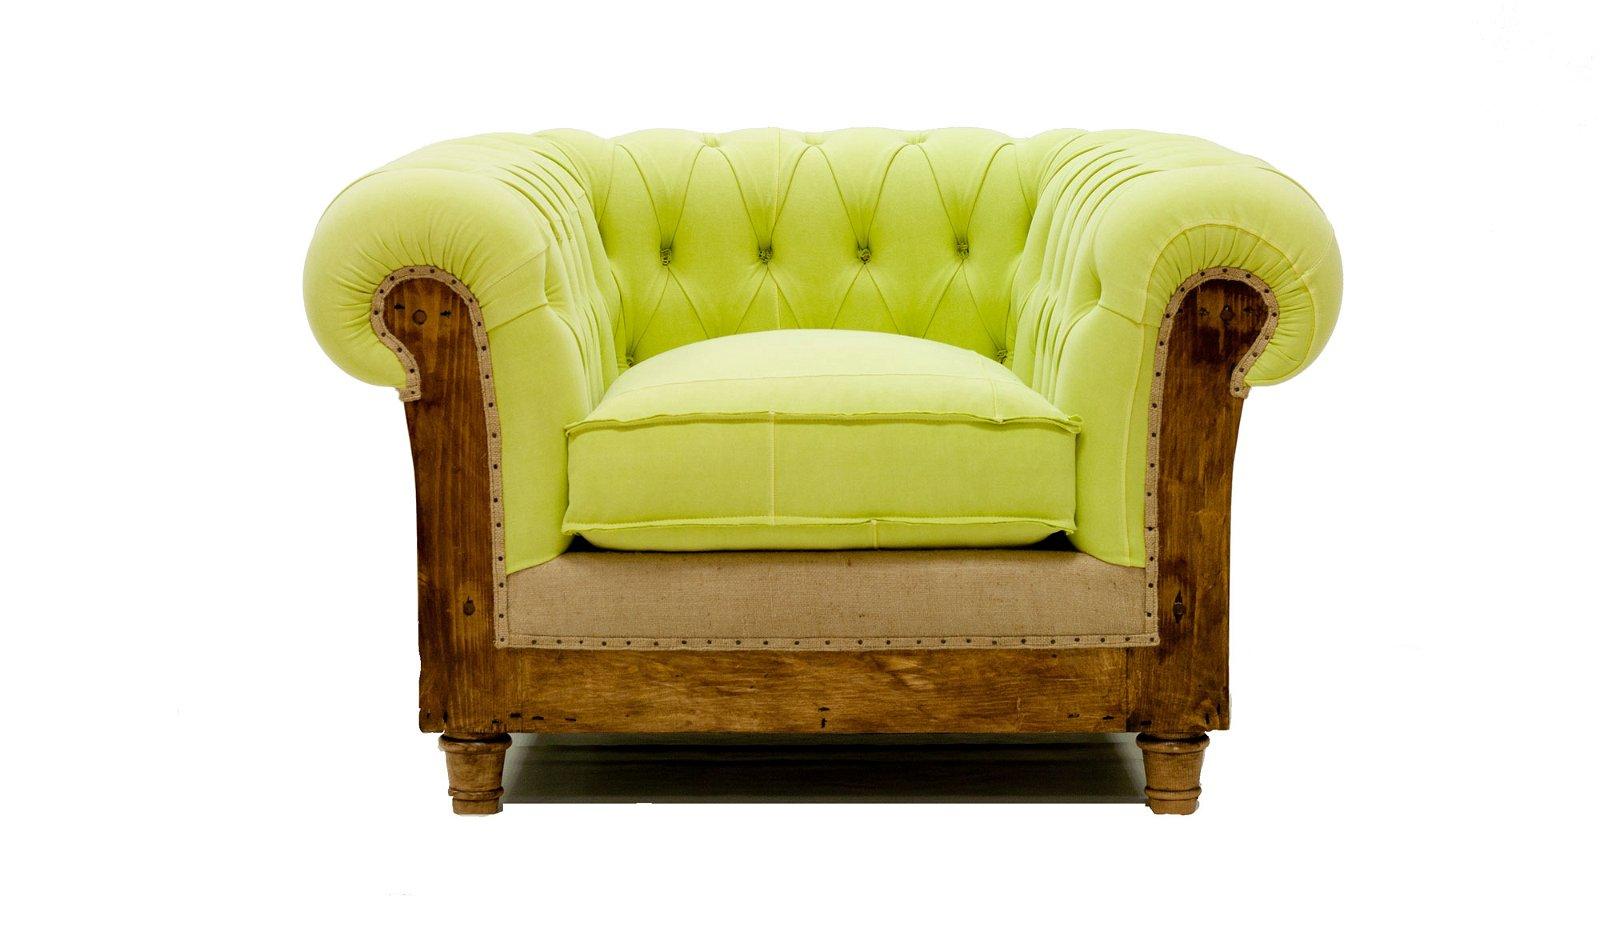 Sillón verde chesterfield Chesire